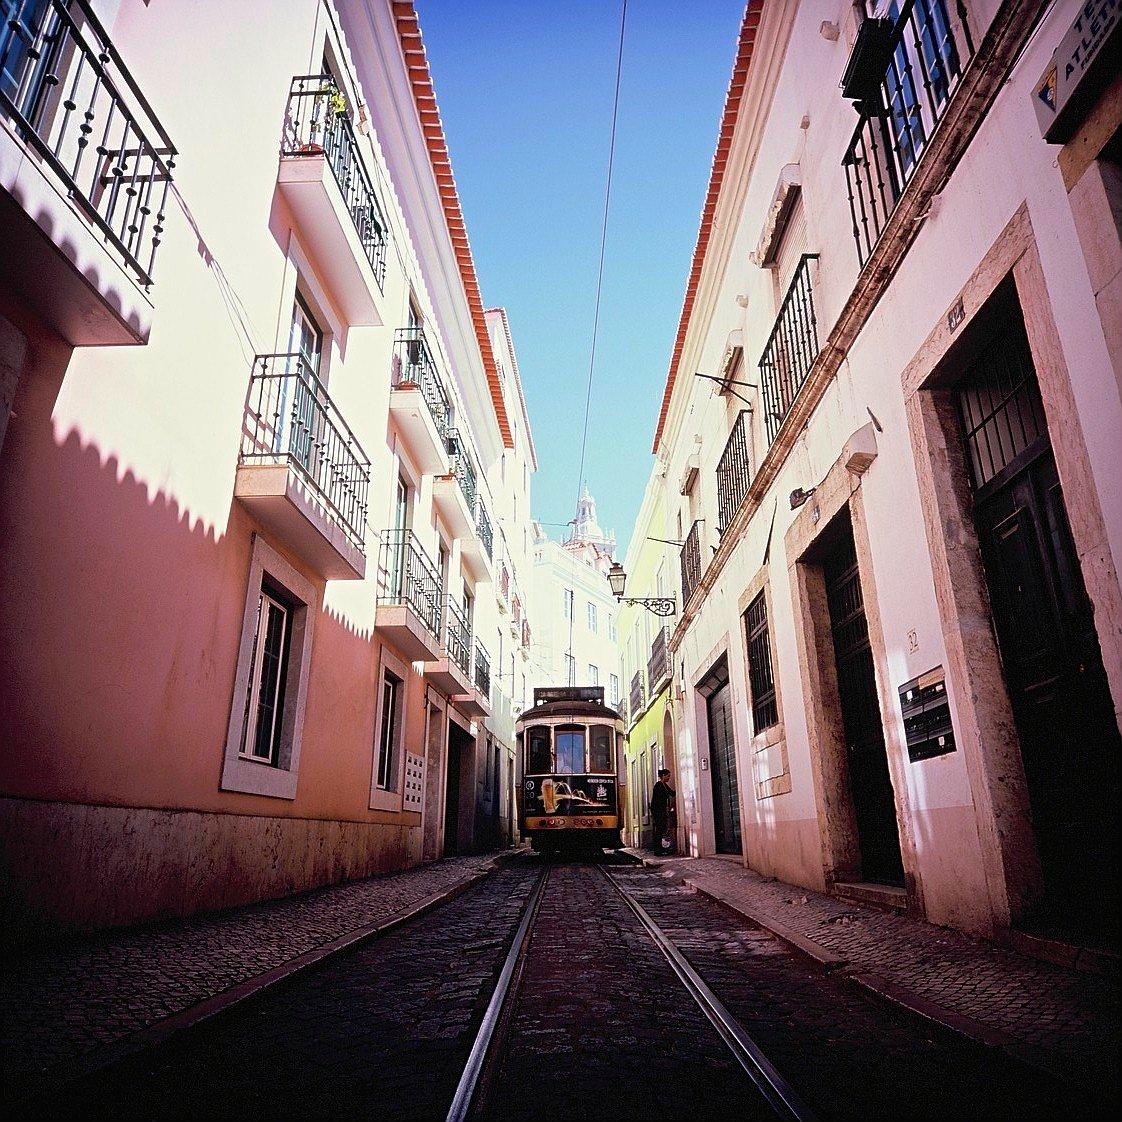 Vinhos e vilarejos de Portugal - Porto